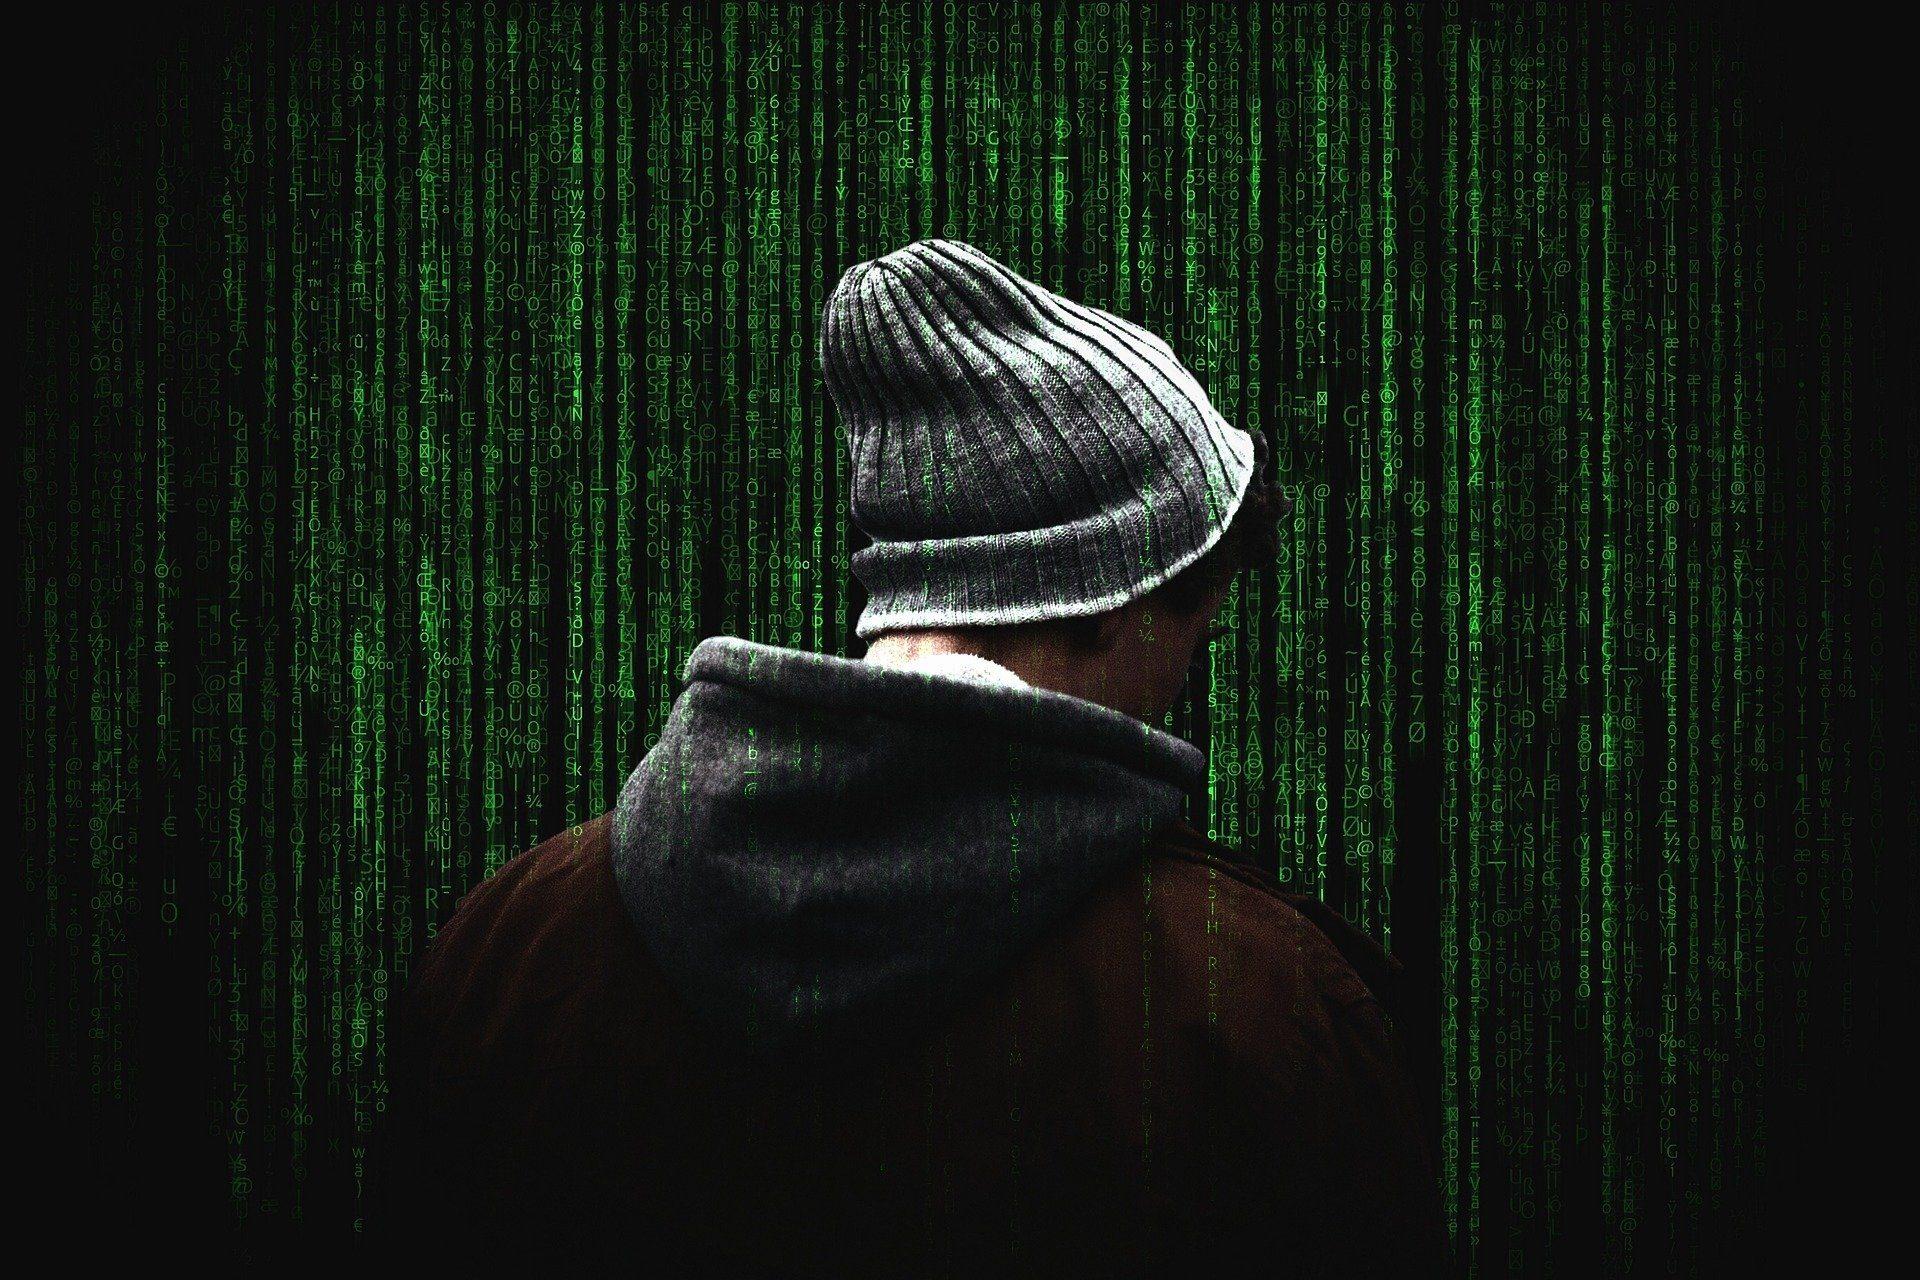 Dónde estudiar ciberseguridad en españa